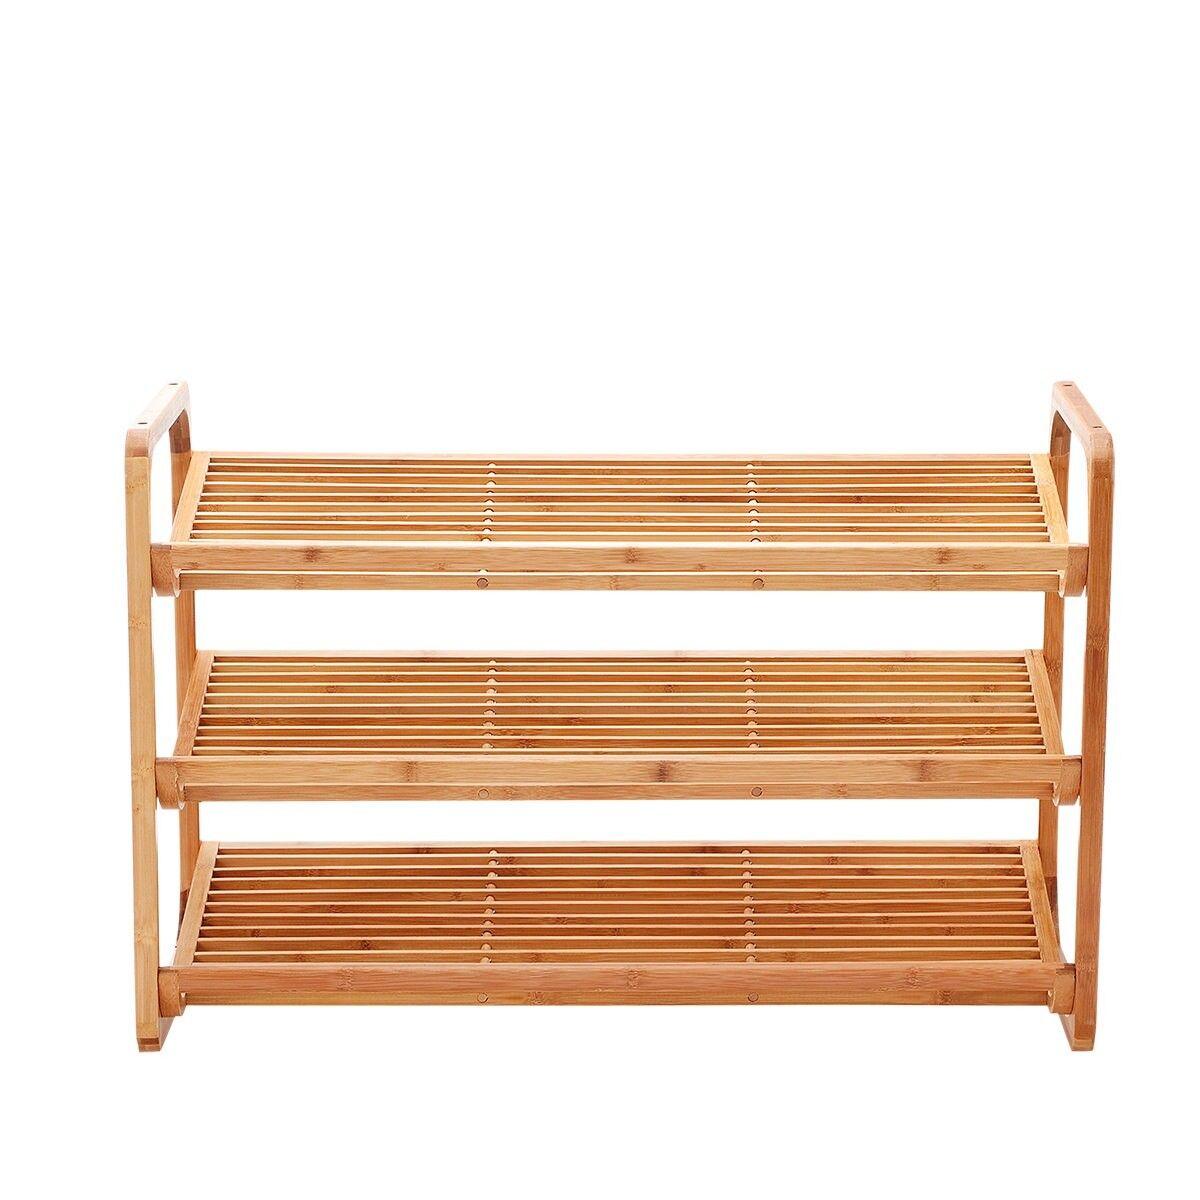 New Ridge Home Goods Natural Bamboo 2-Tier Shoe Rack Storage Cabinet White